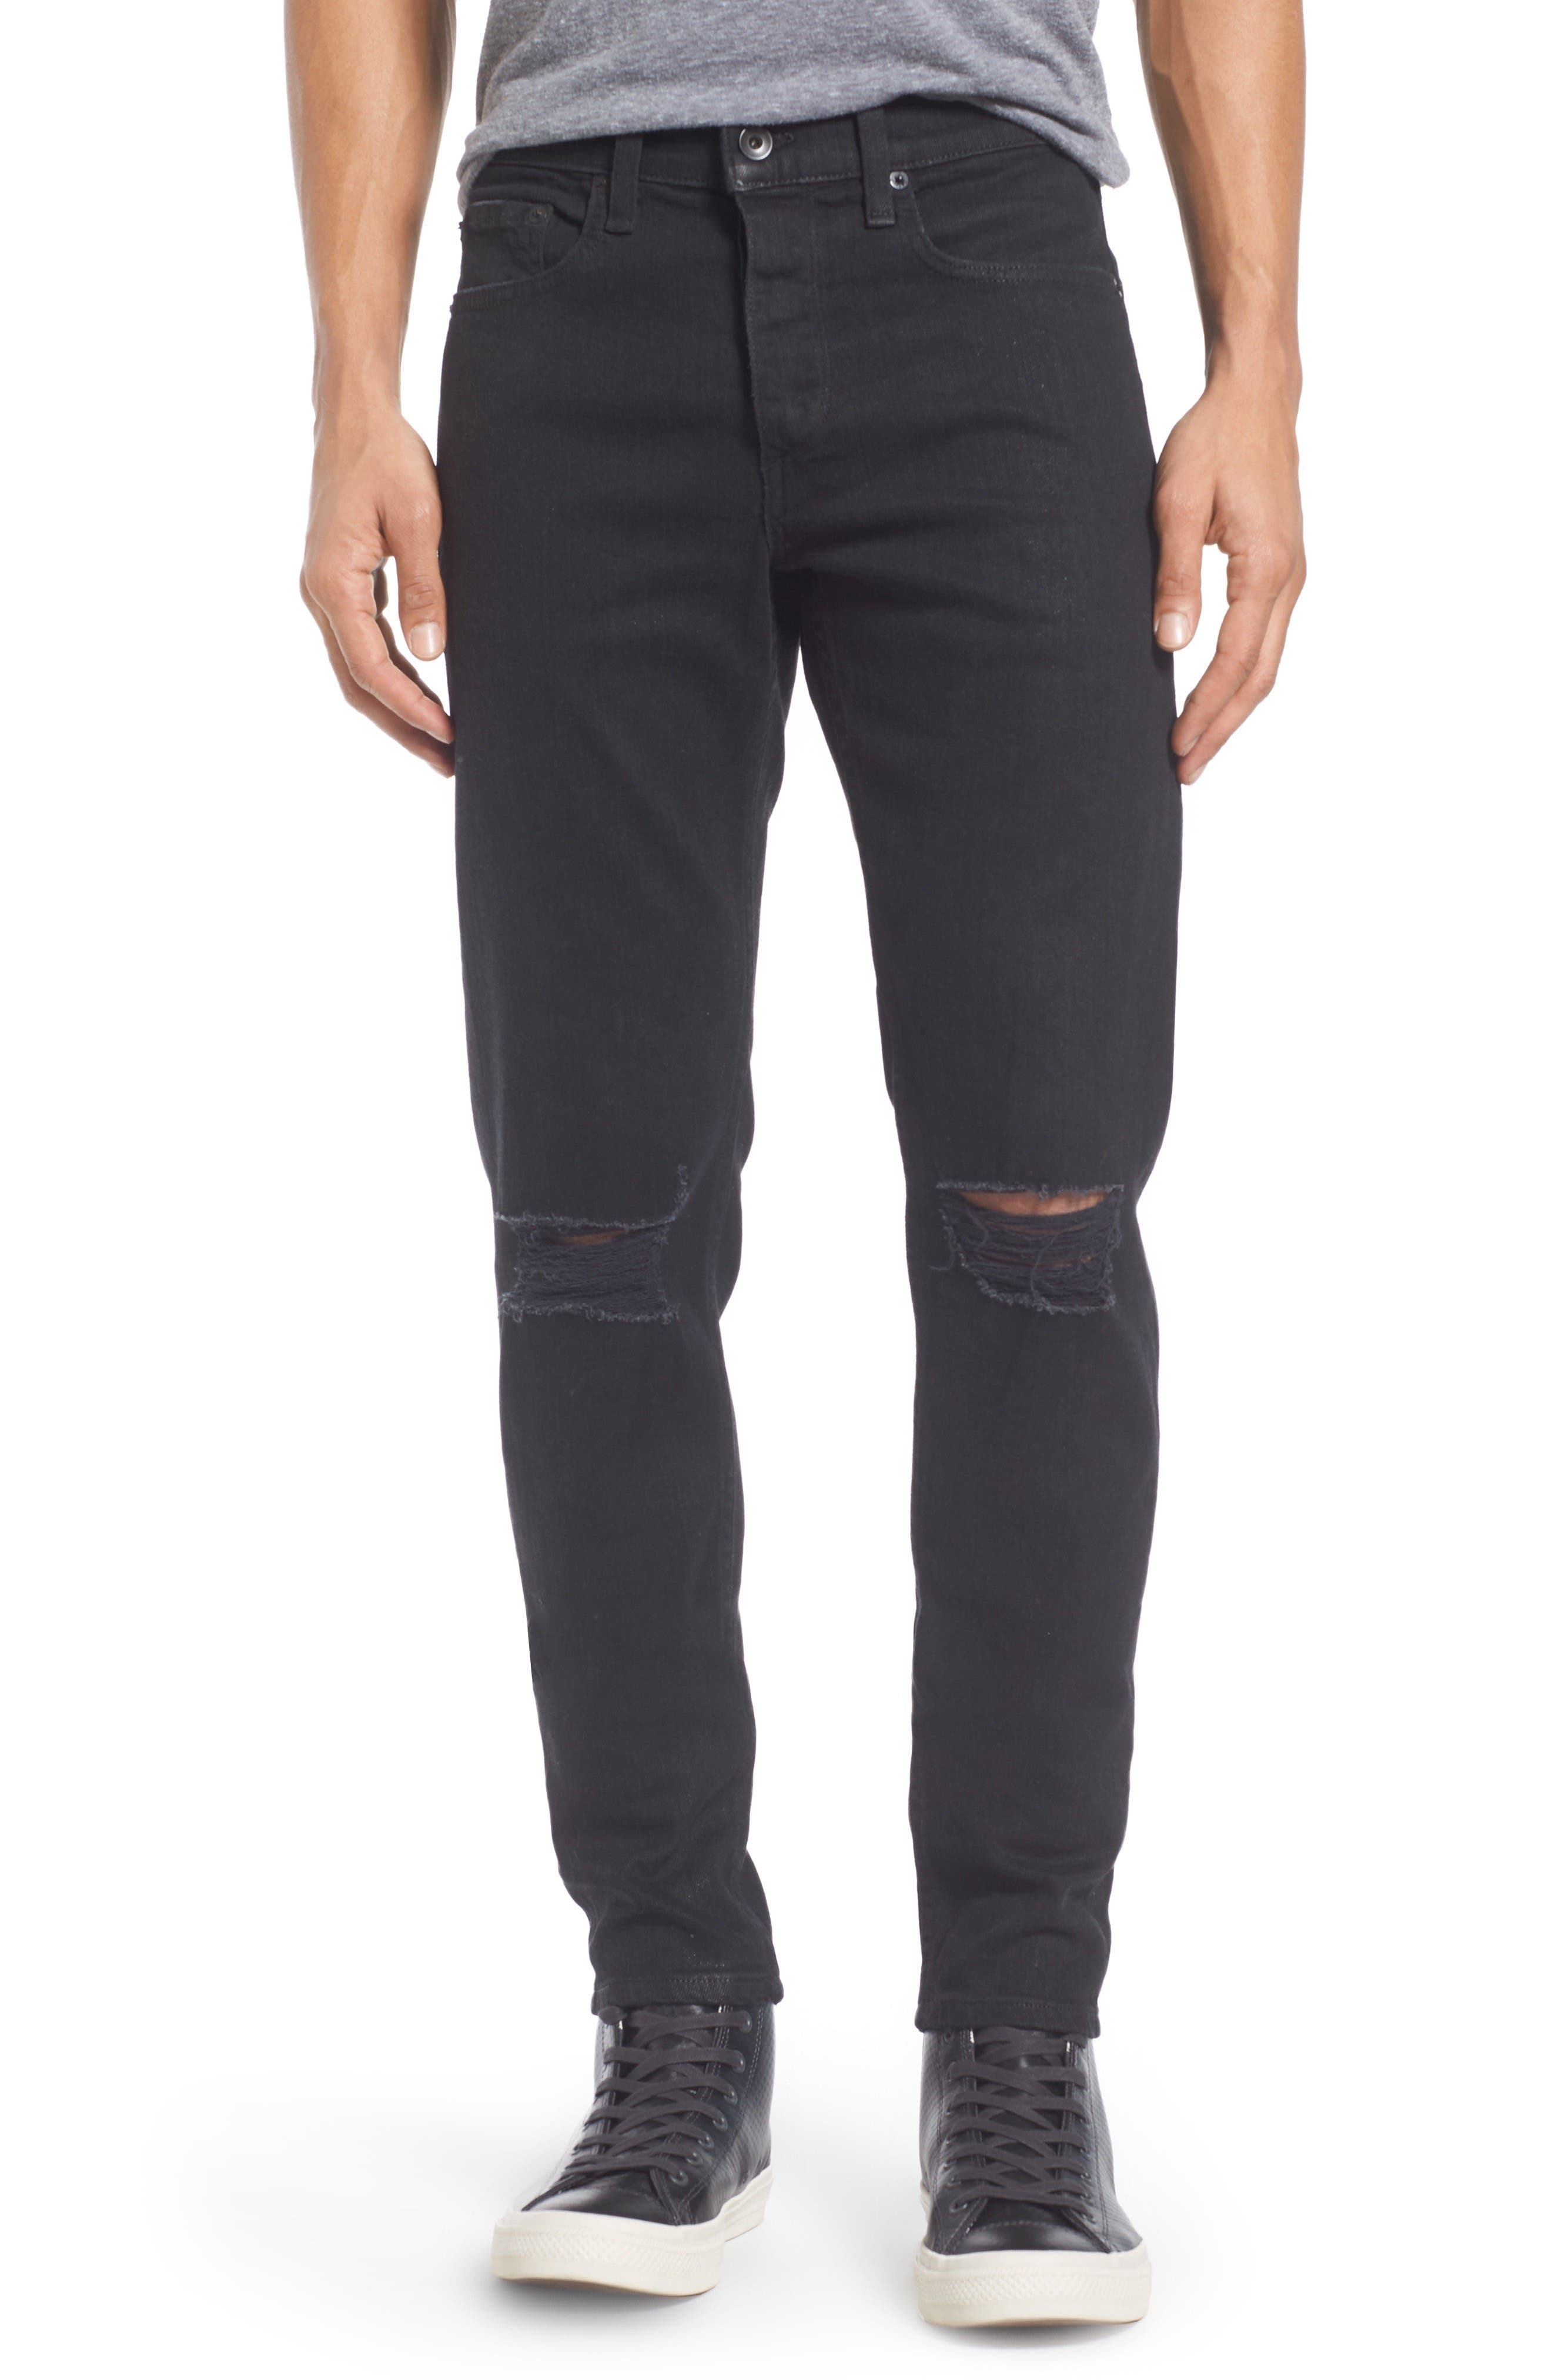 Fit 1 Skinny Fit Jeans,                         Main,                         color, Black